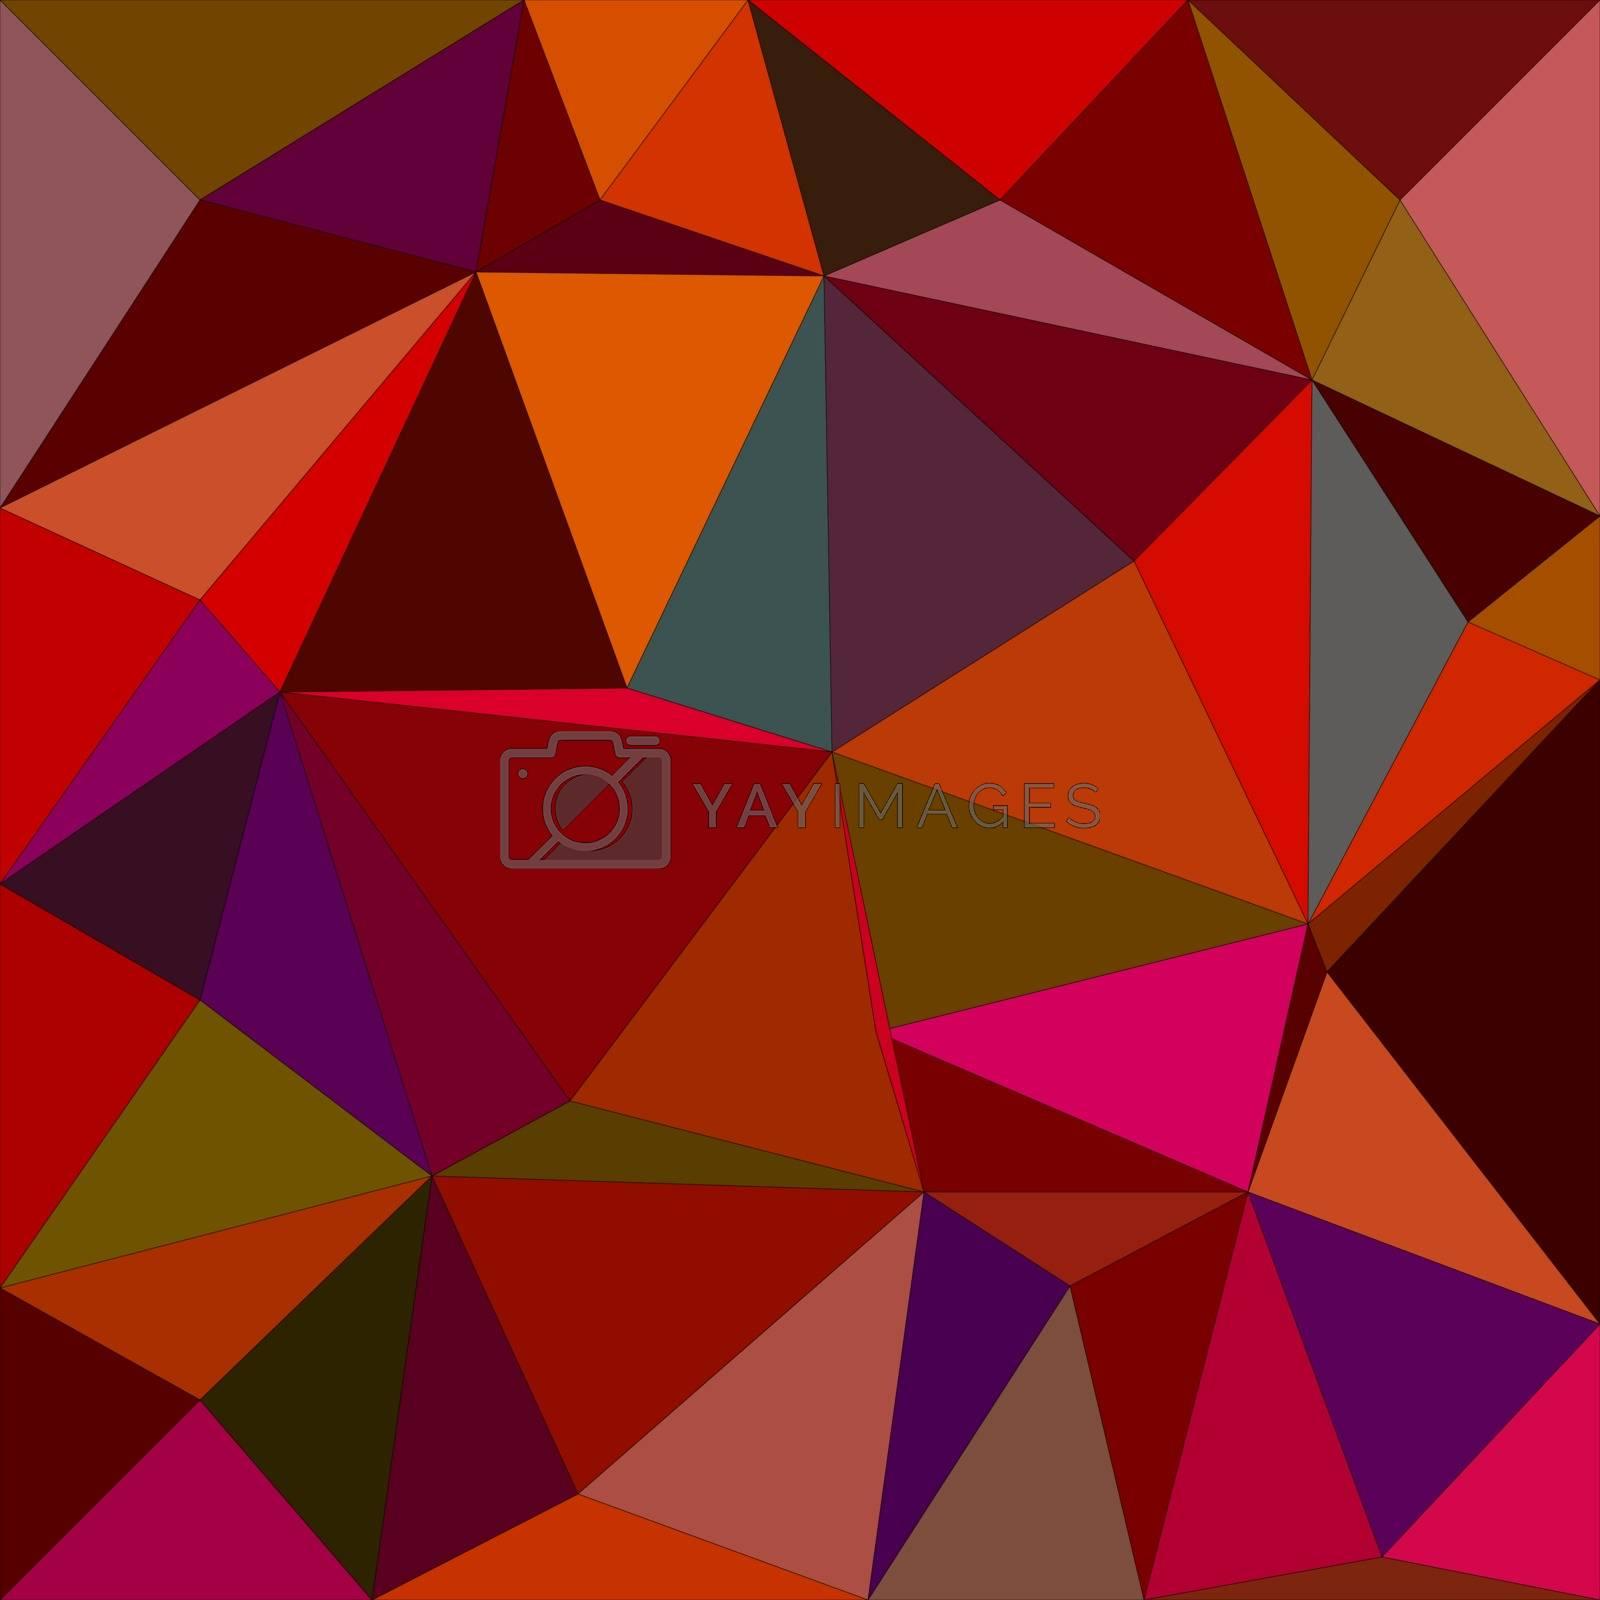 Dark color irregular triangle mosaic vector background design